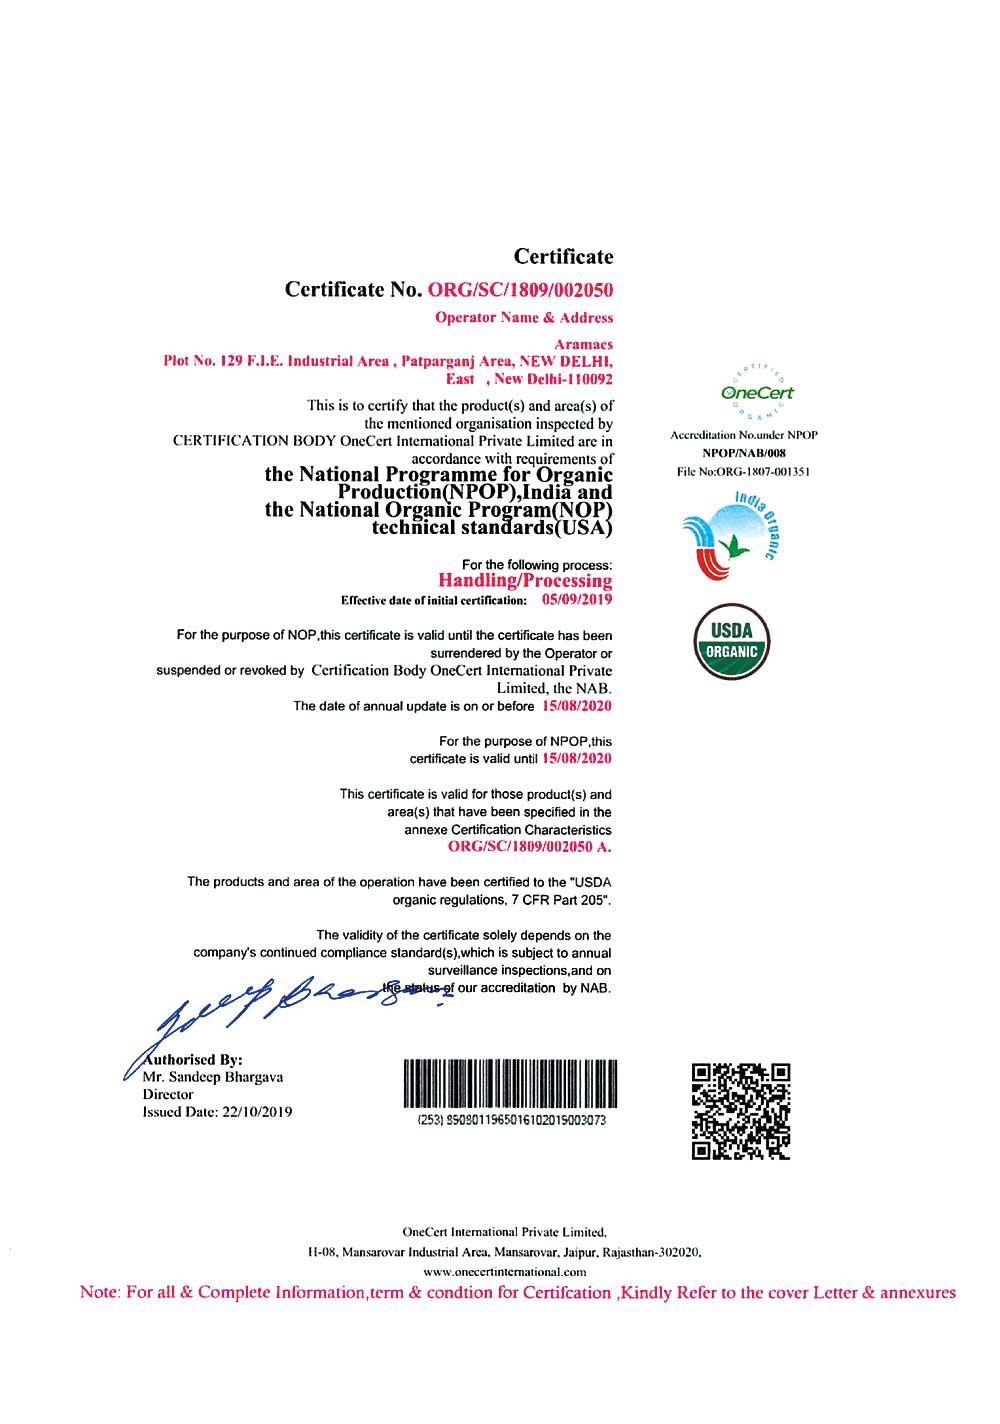 USDA Certified Essential Oil Company